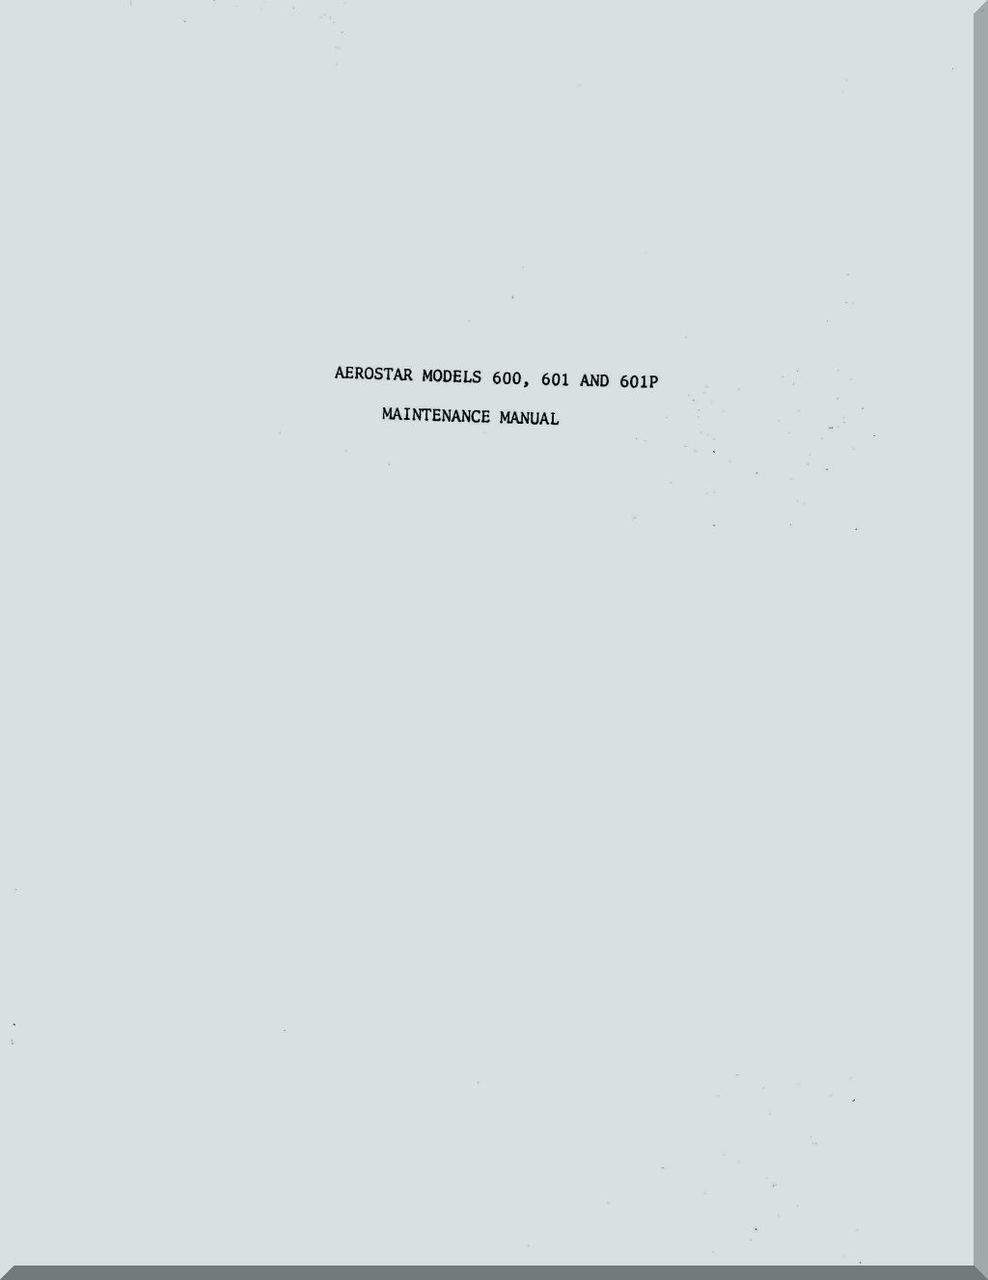 Piper Aircraft 600, 601 601P Aerostar Aircraft Maintenance Manual. Price:  $14.85. Image 1